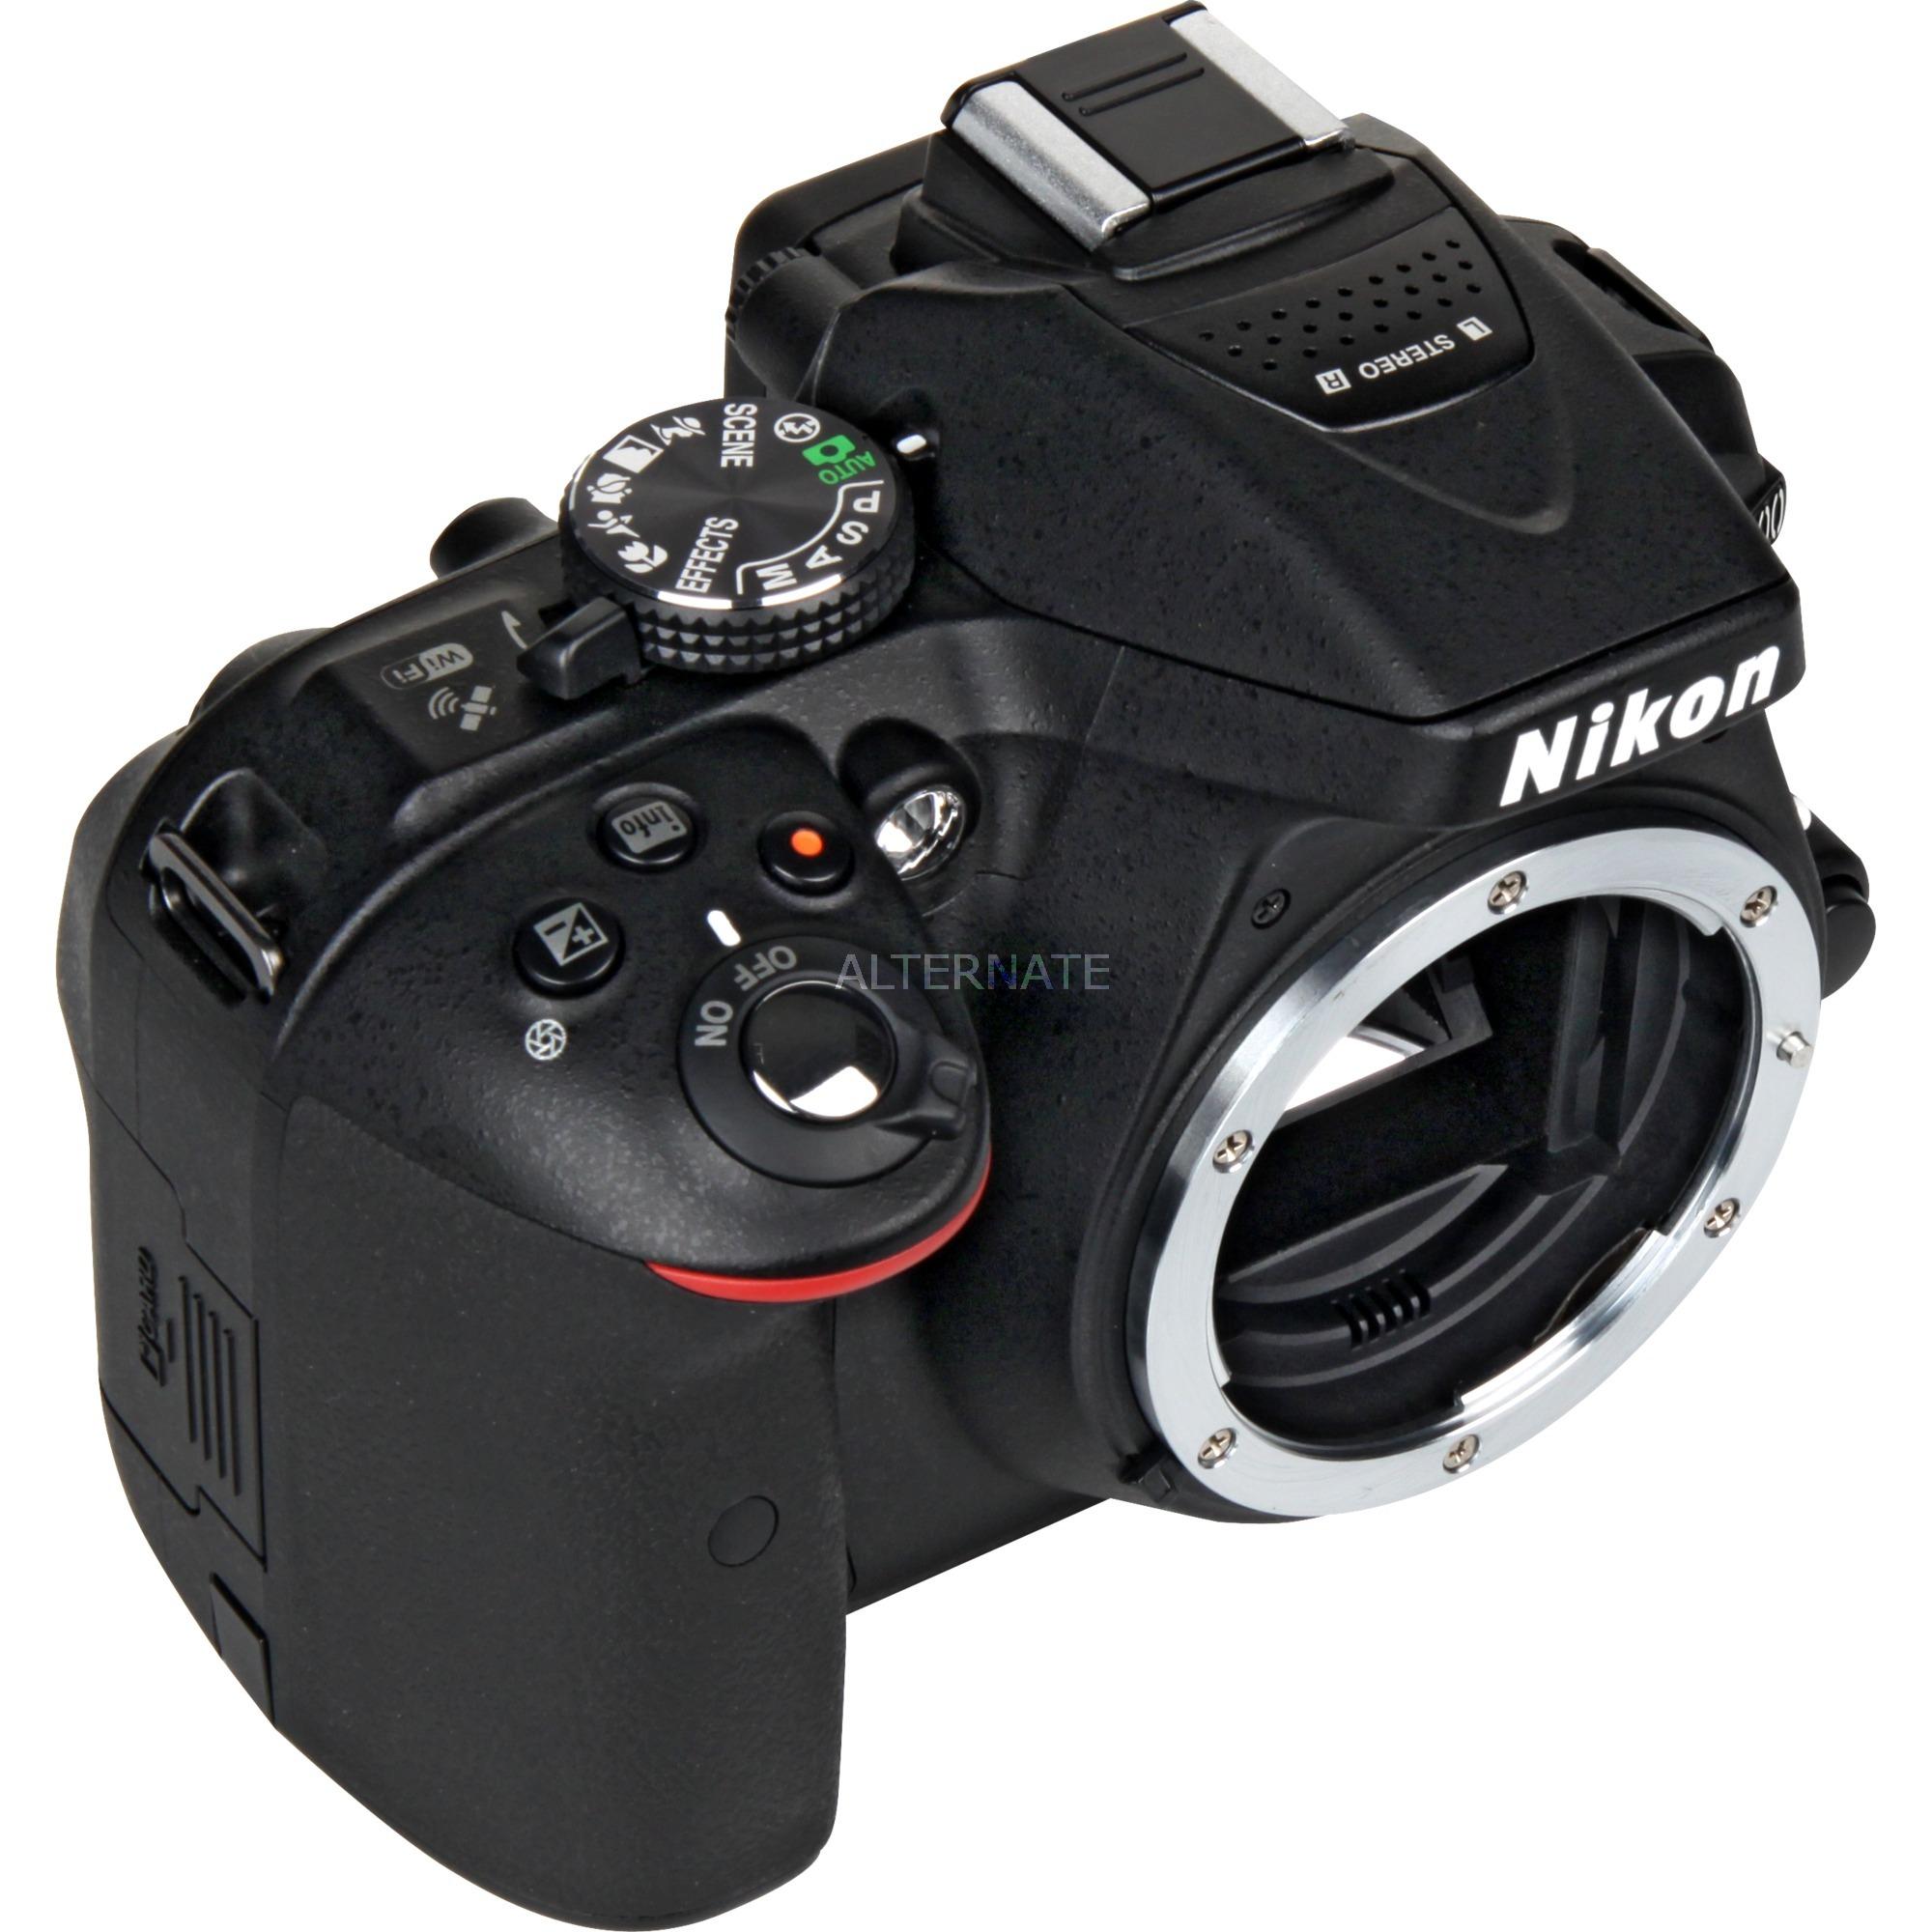 D5300 Cuerpo de la cámara SLR 24.2MP CMOS 6000 x 4000Pixeles Negro, Cámara digital